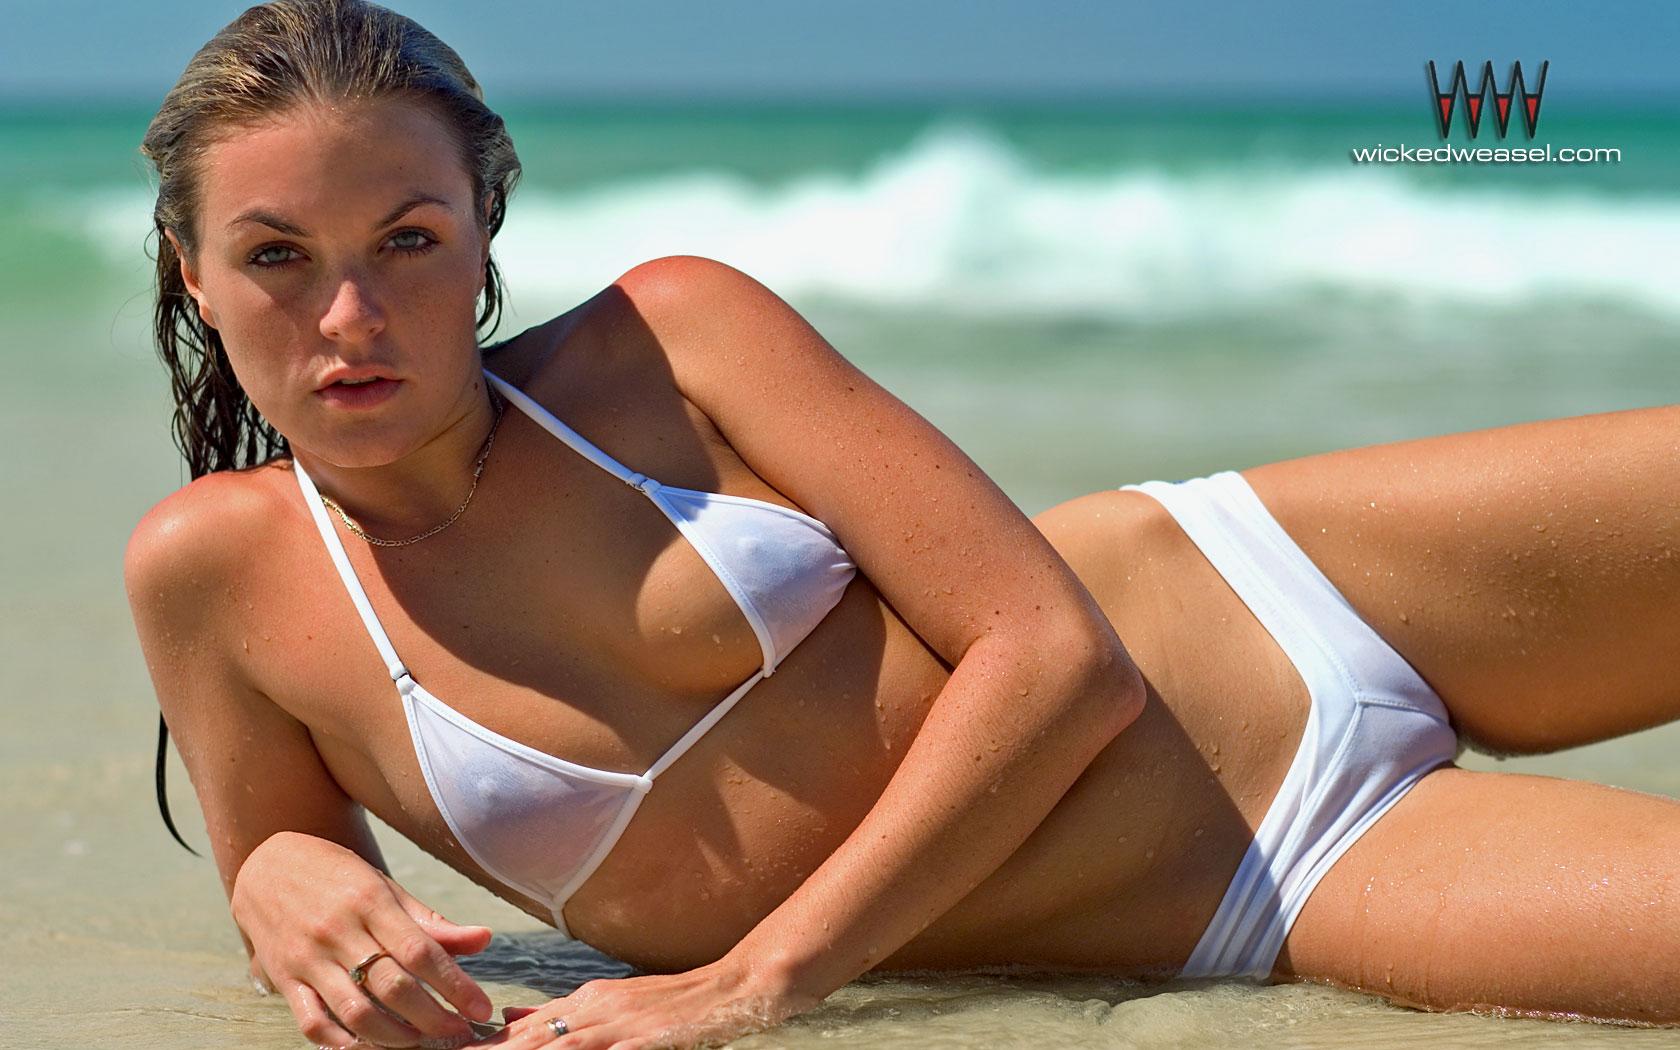 gratis erotisk sexiga bikini